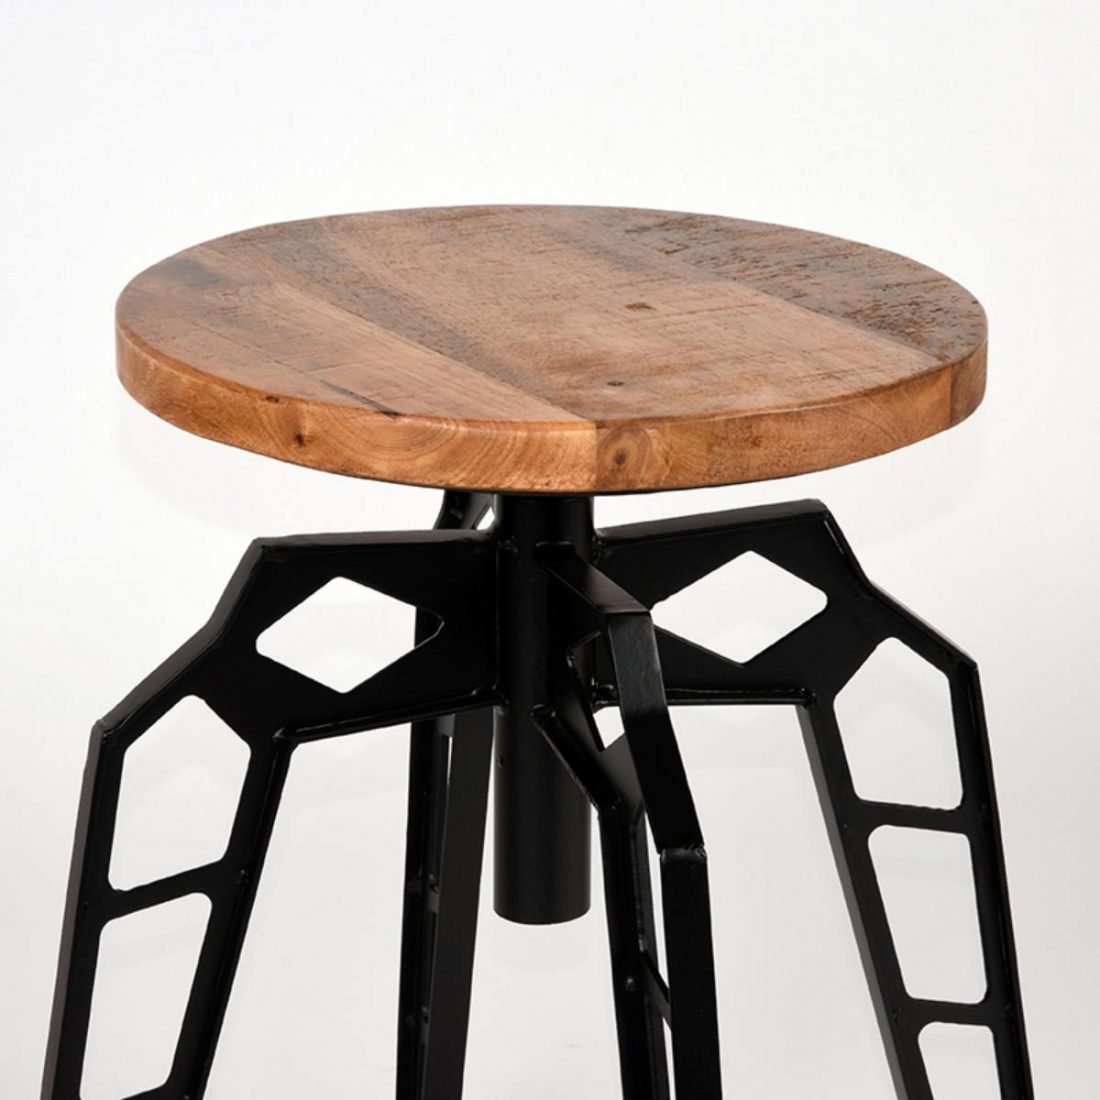 Kruk Pebble Zwart Metaal Rough Mangohout 35x35x52 Cm Detail 1